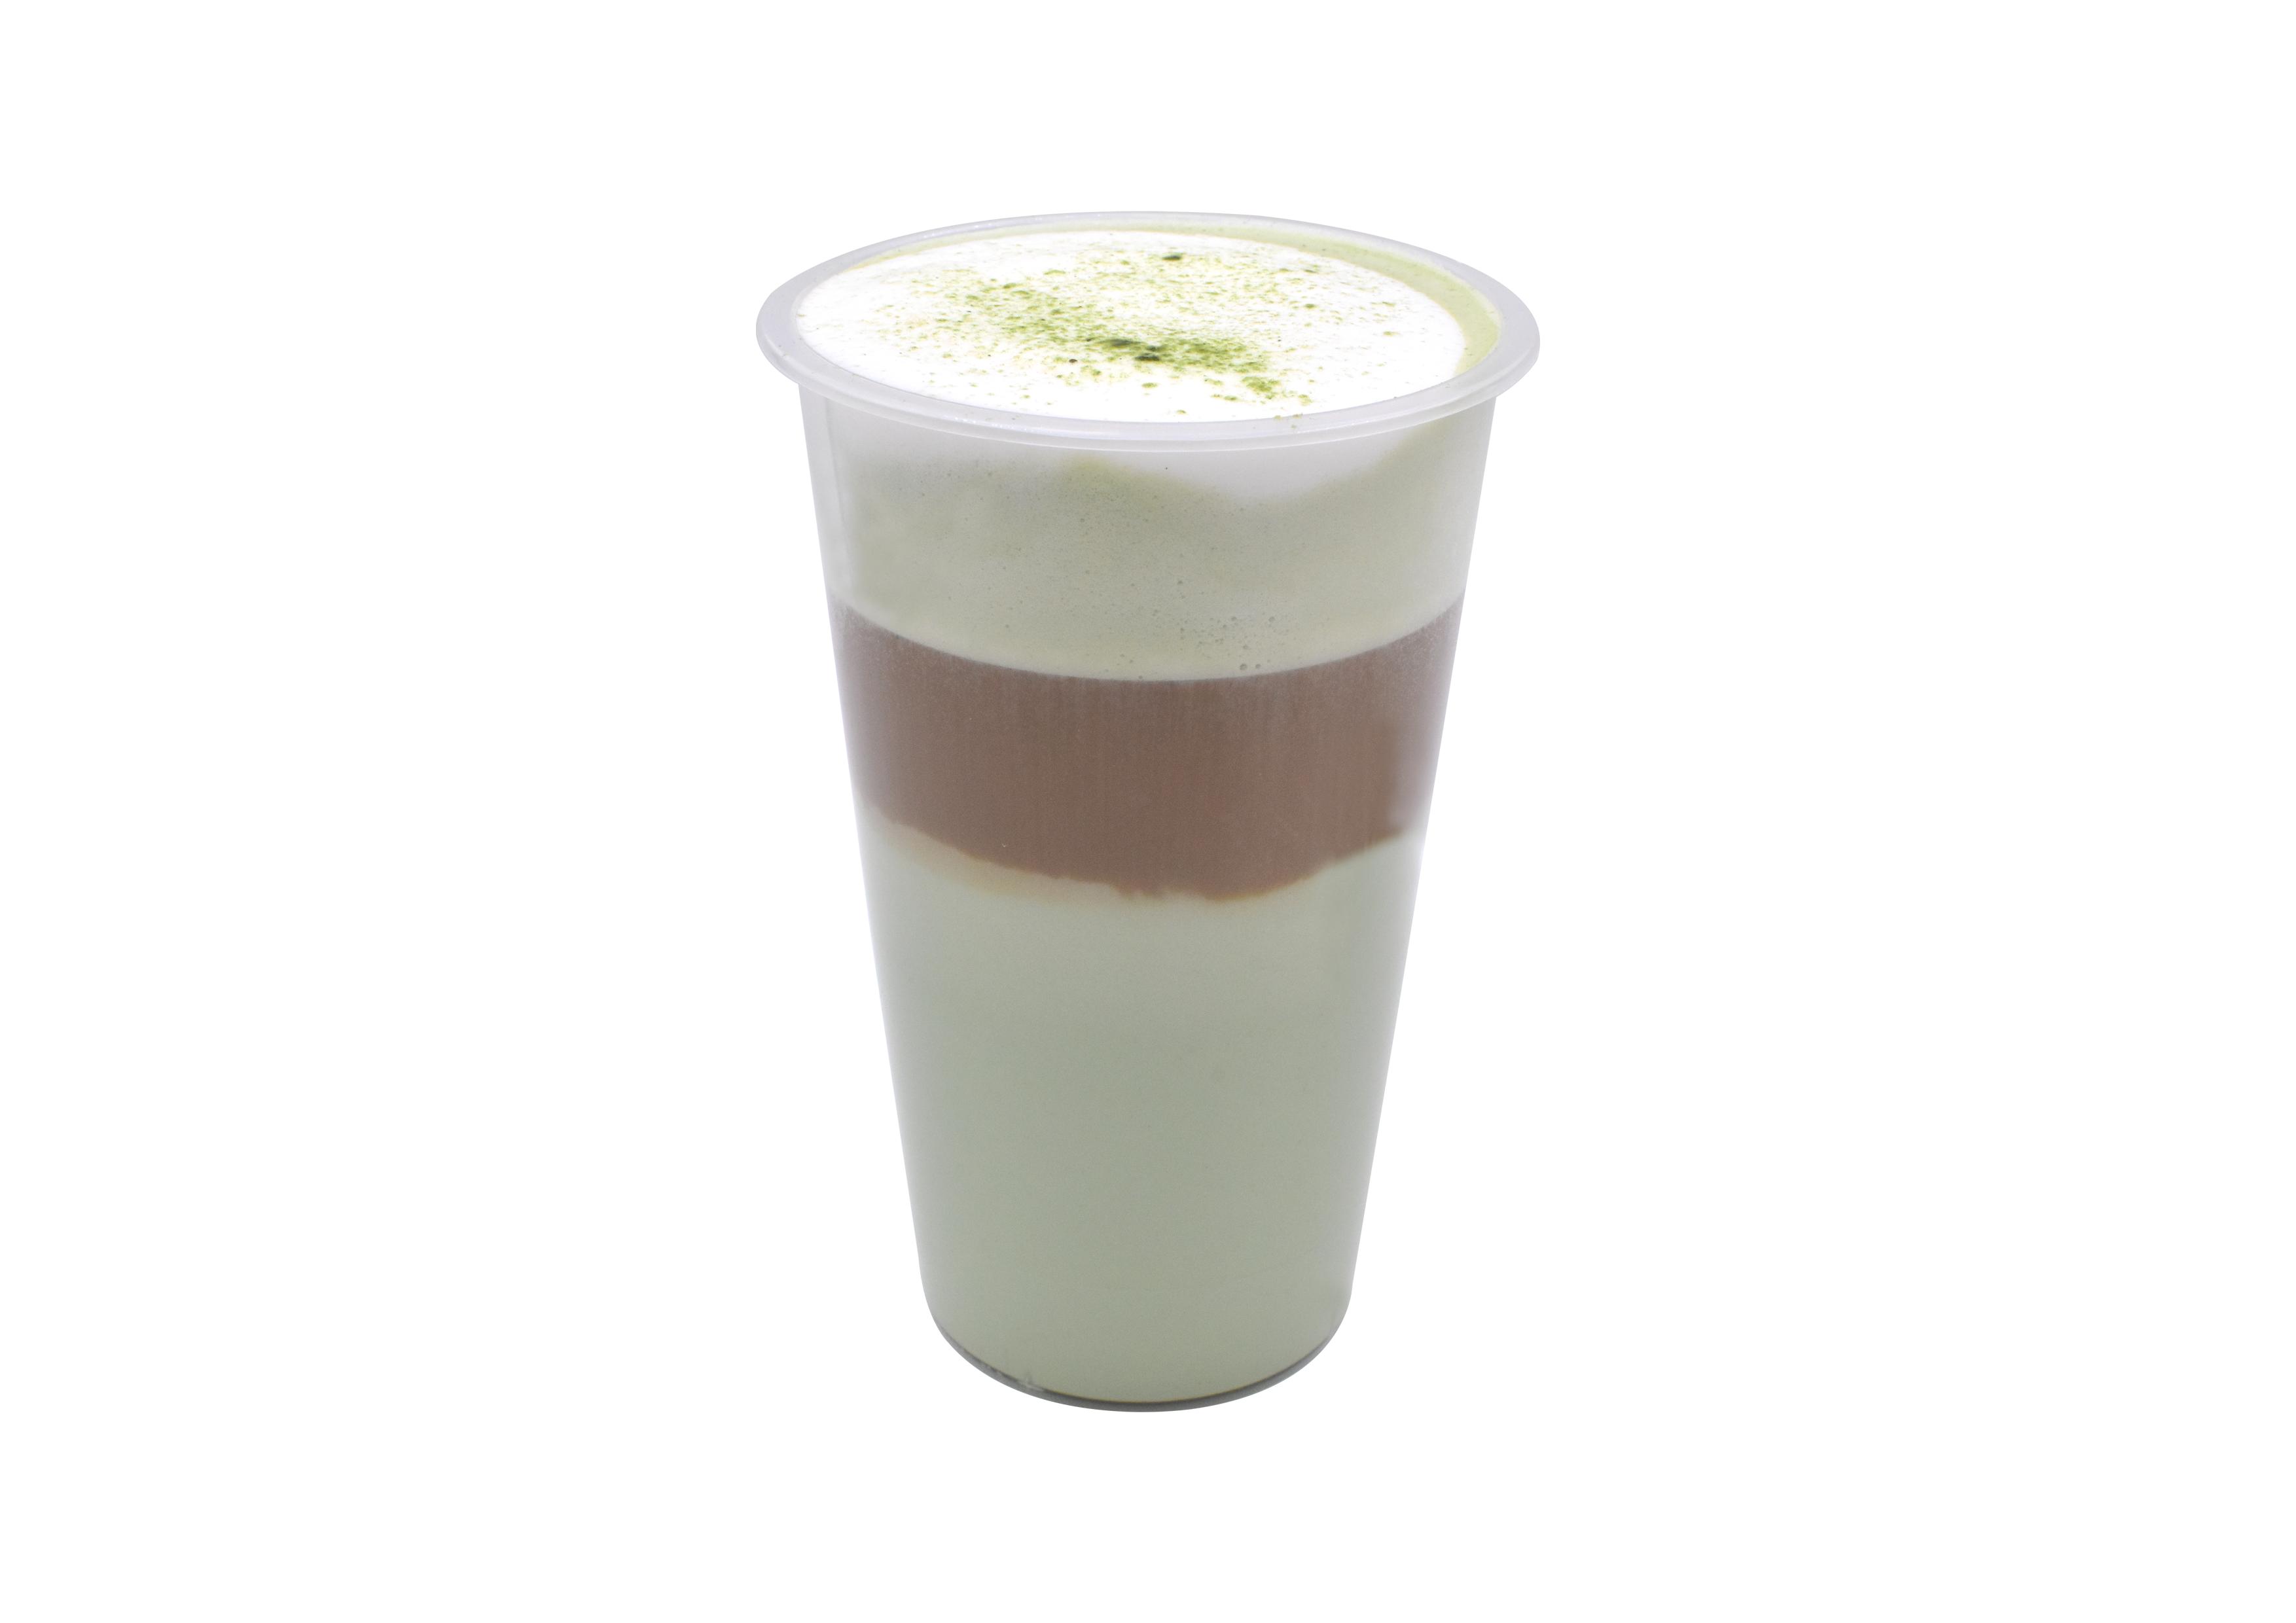 抹茶白巧拿铁(Matcha white chocolate latte)